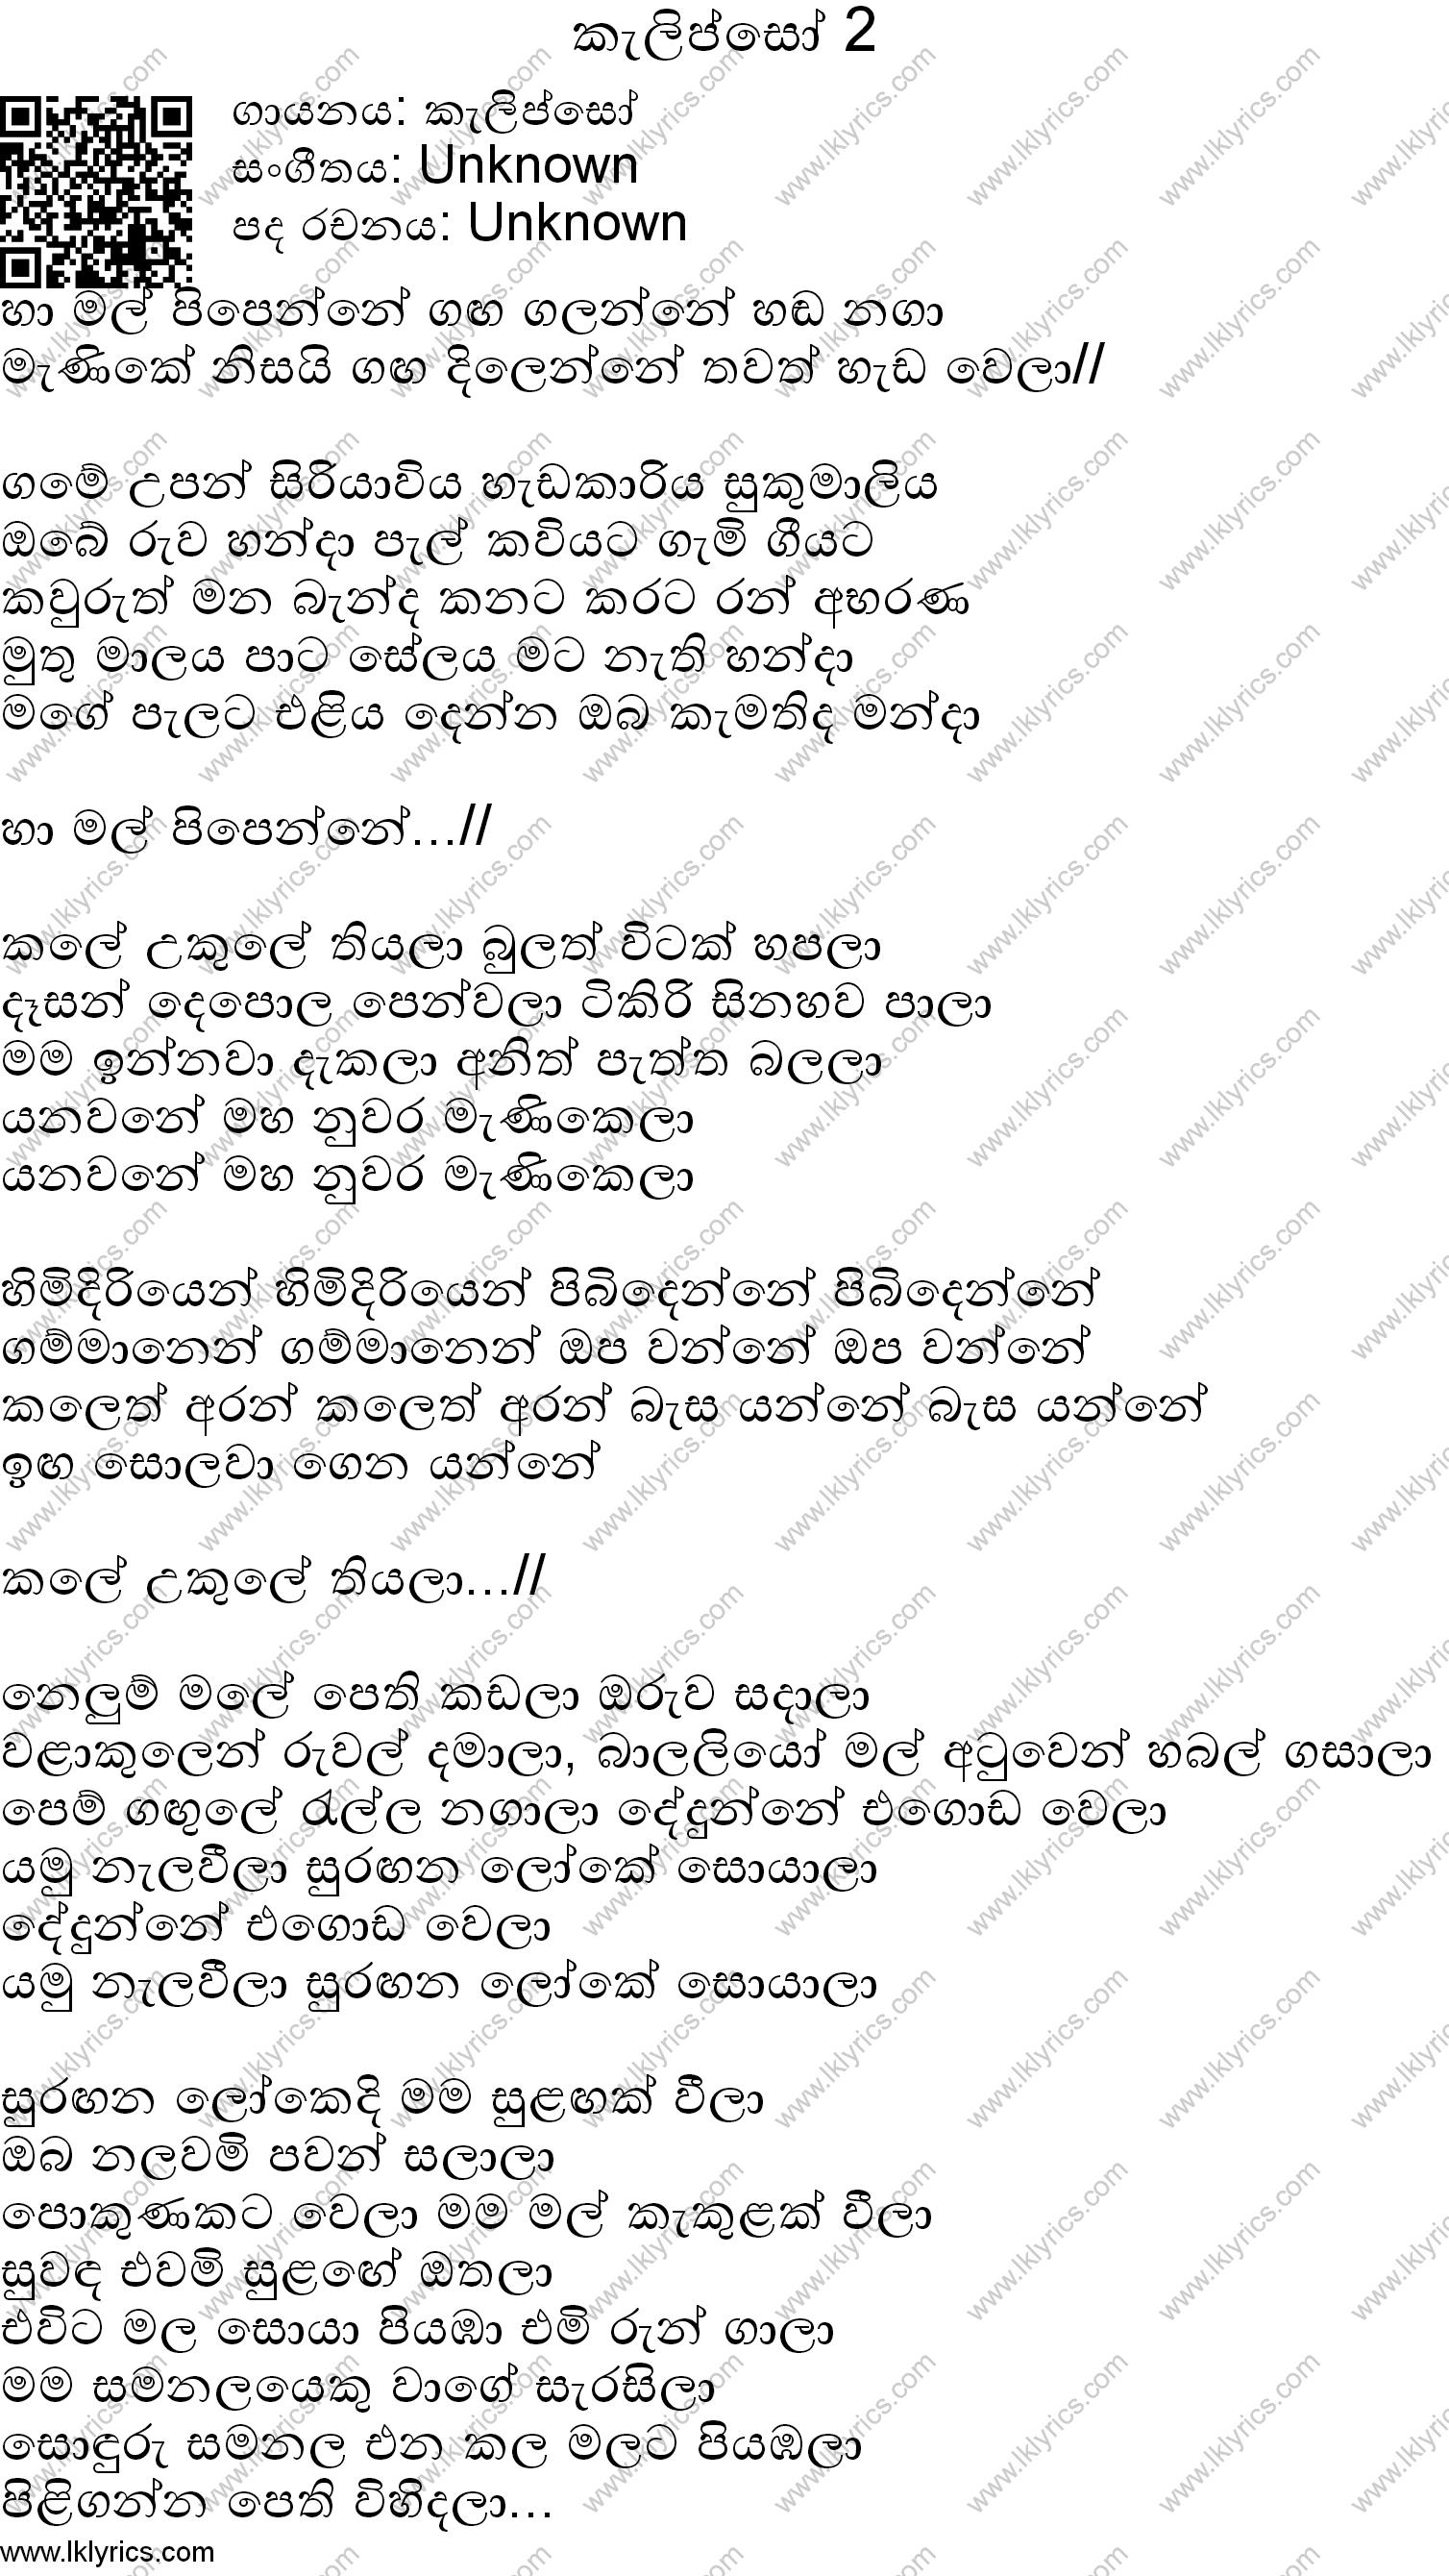 Sinhala songs non stop free download